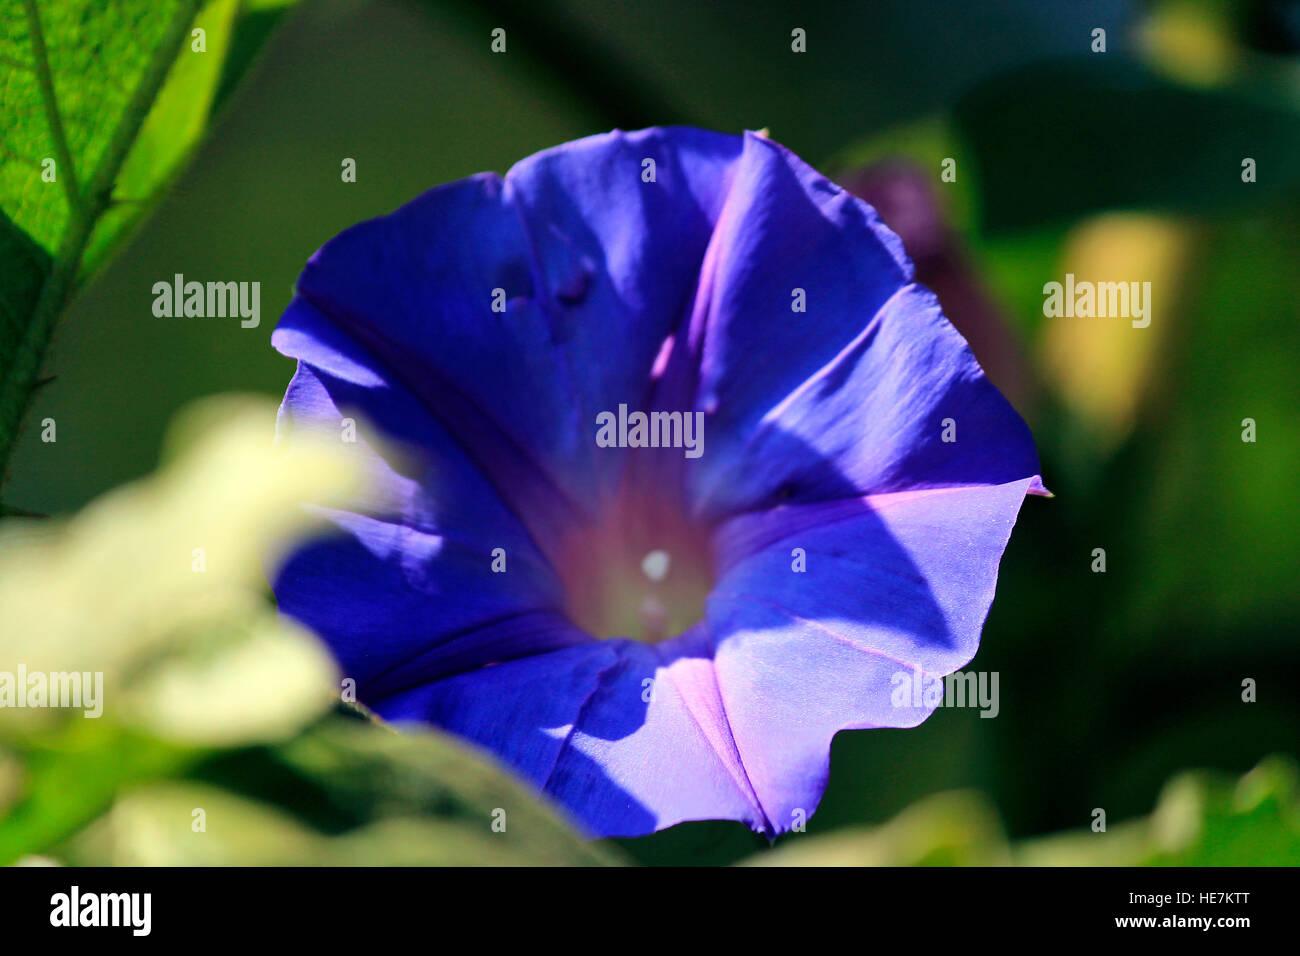 Sunbath - Stock Image